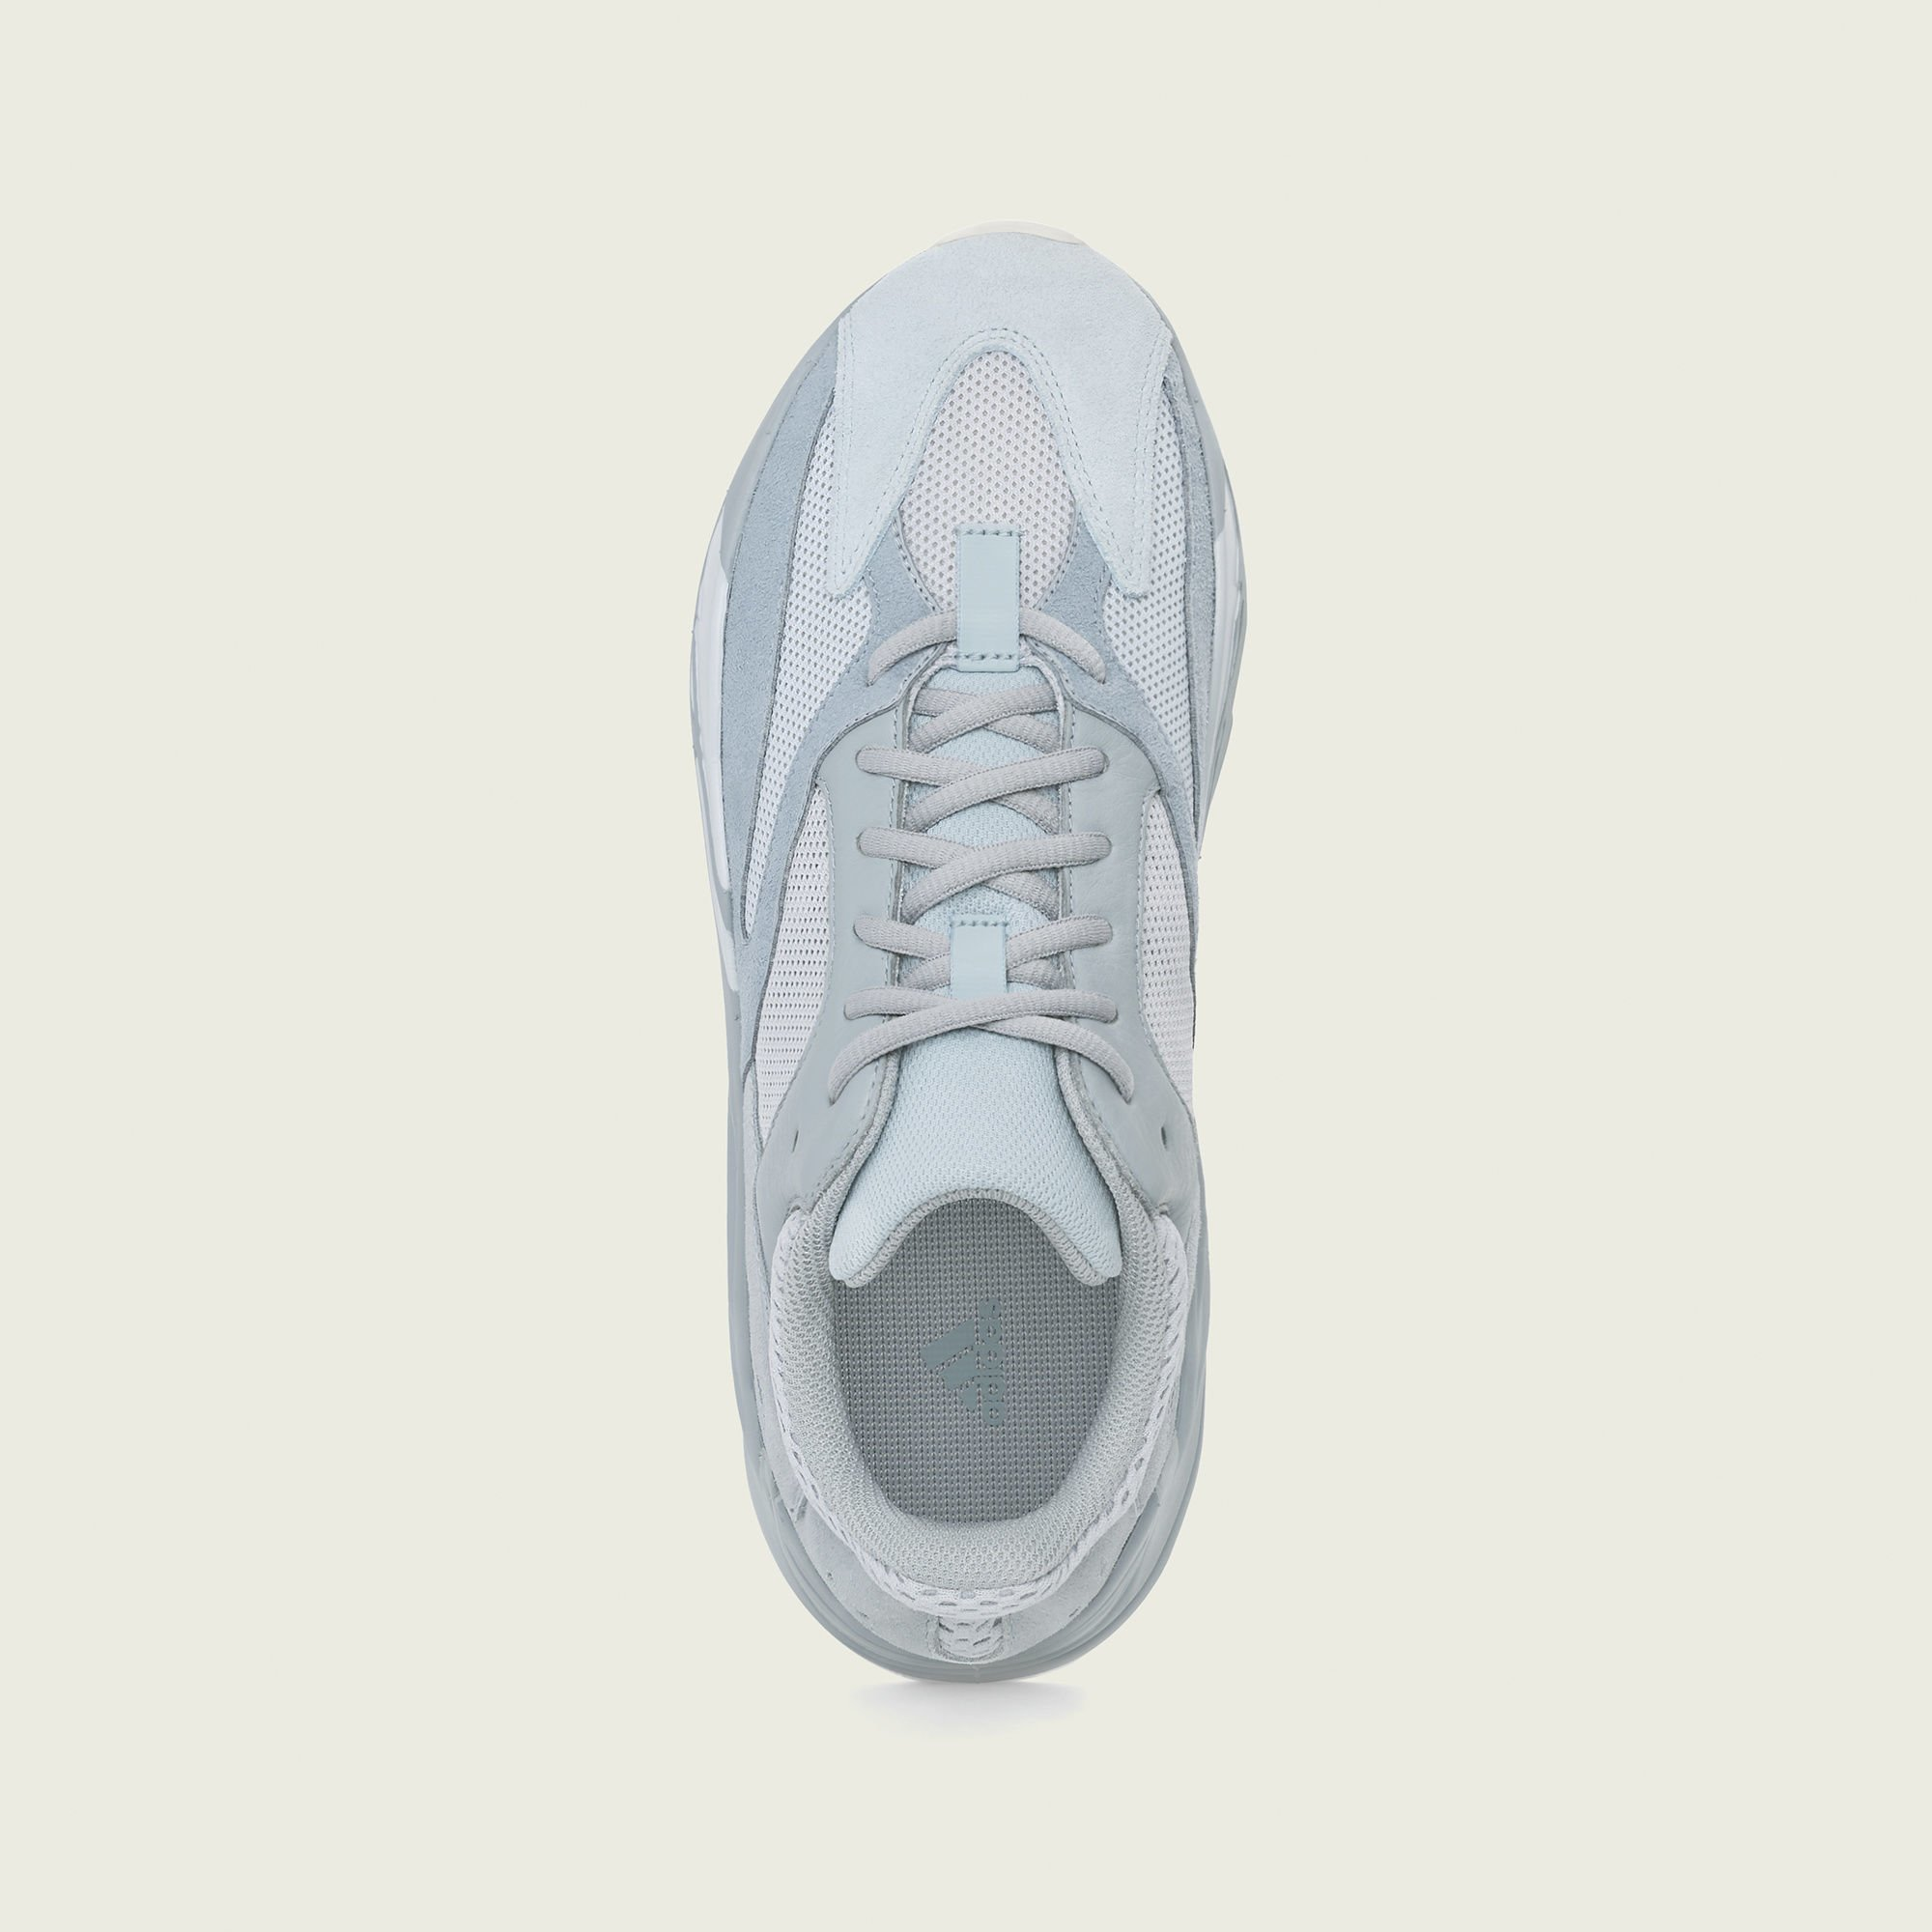 adidas Yeezy Boost 700 'Inertia' (EG7597)